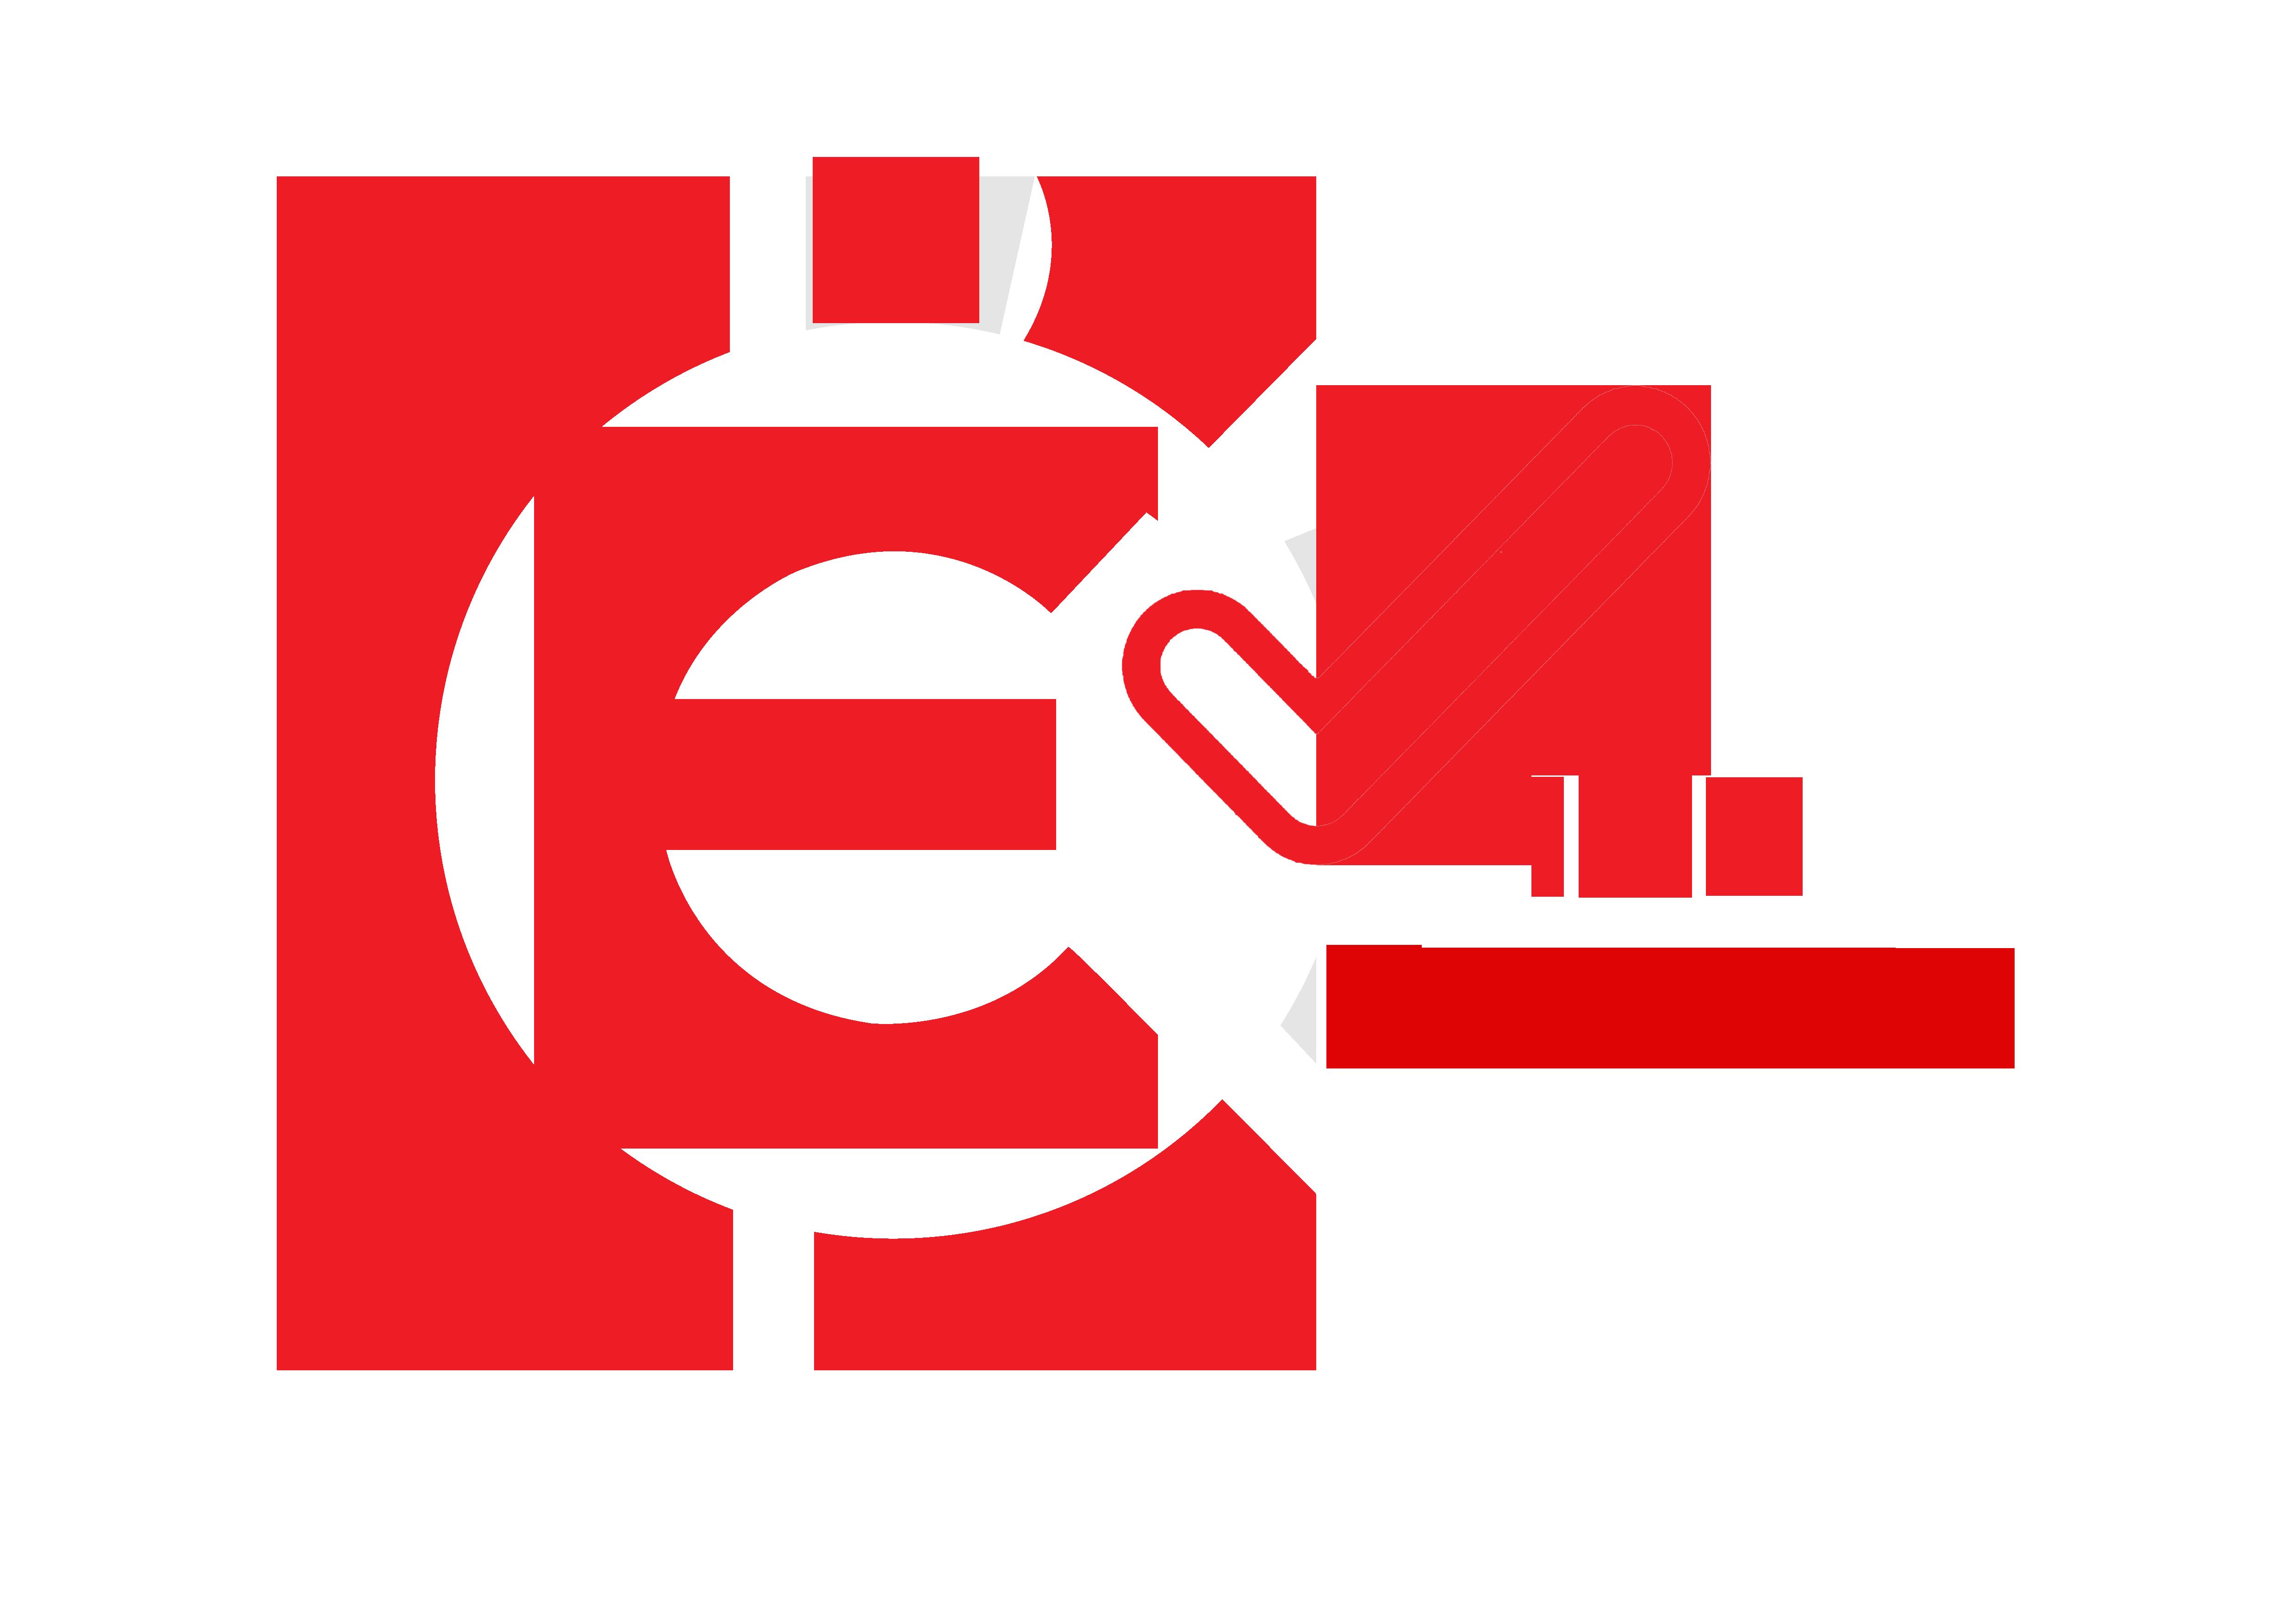 Indonesia Cyber Education Institute